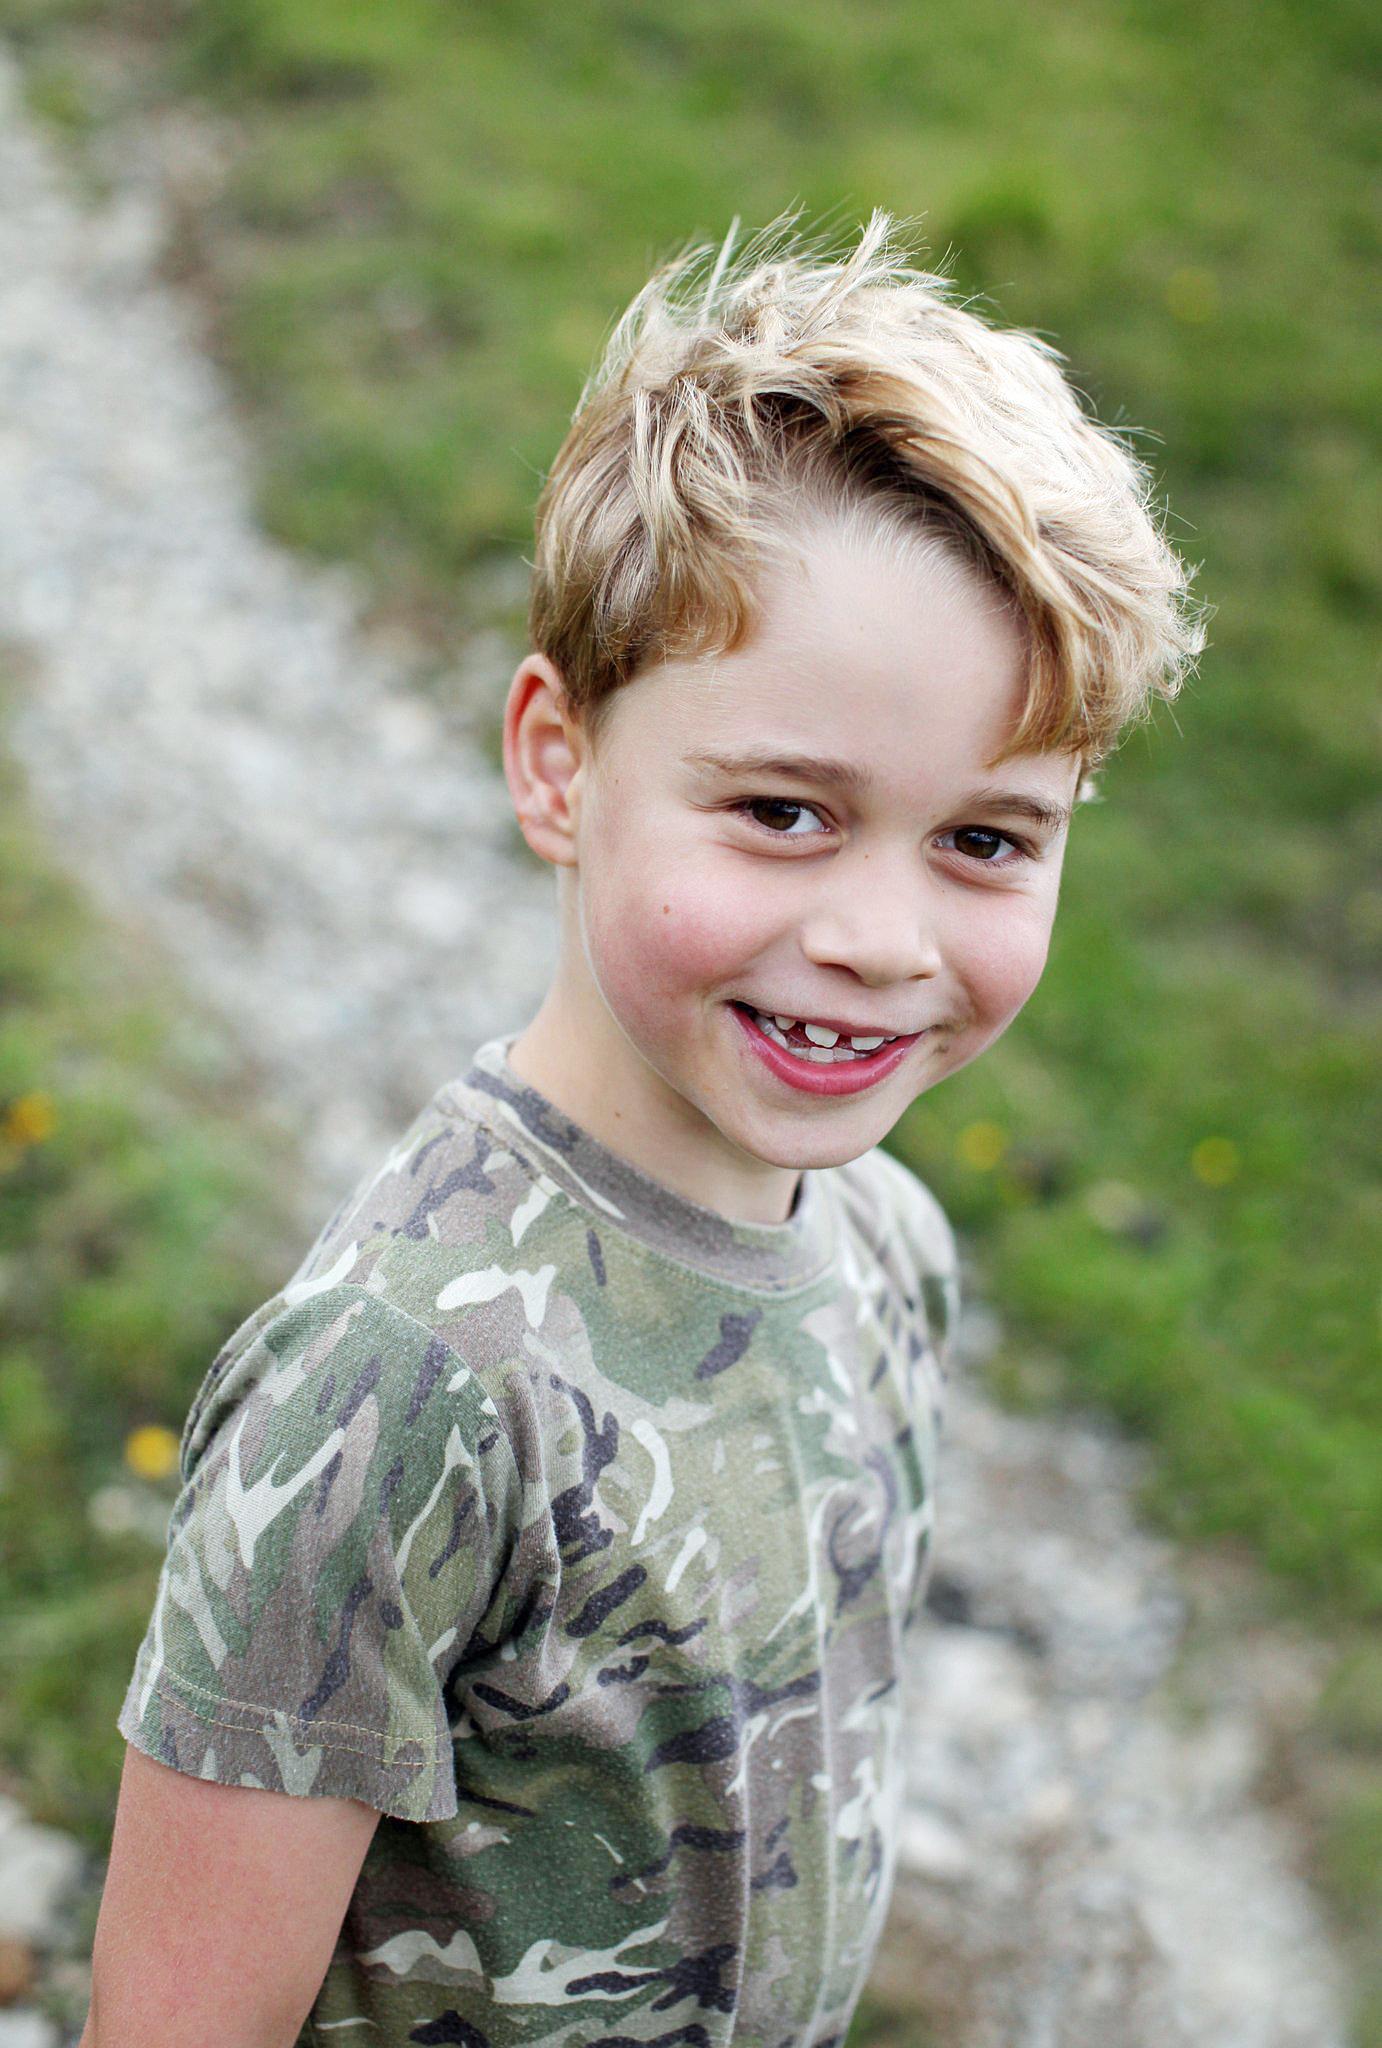 Prince George Celebrates 7th Birthday